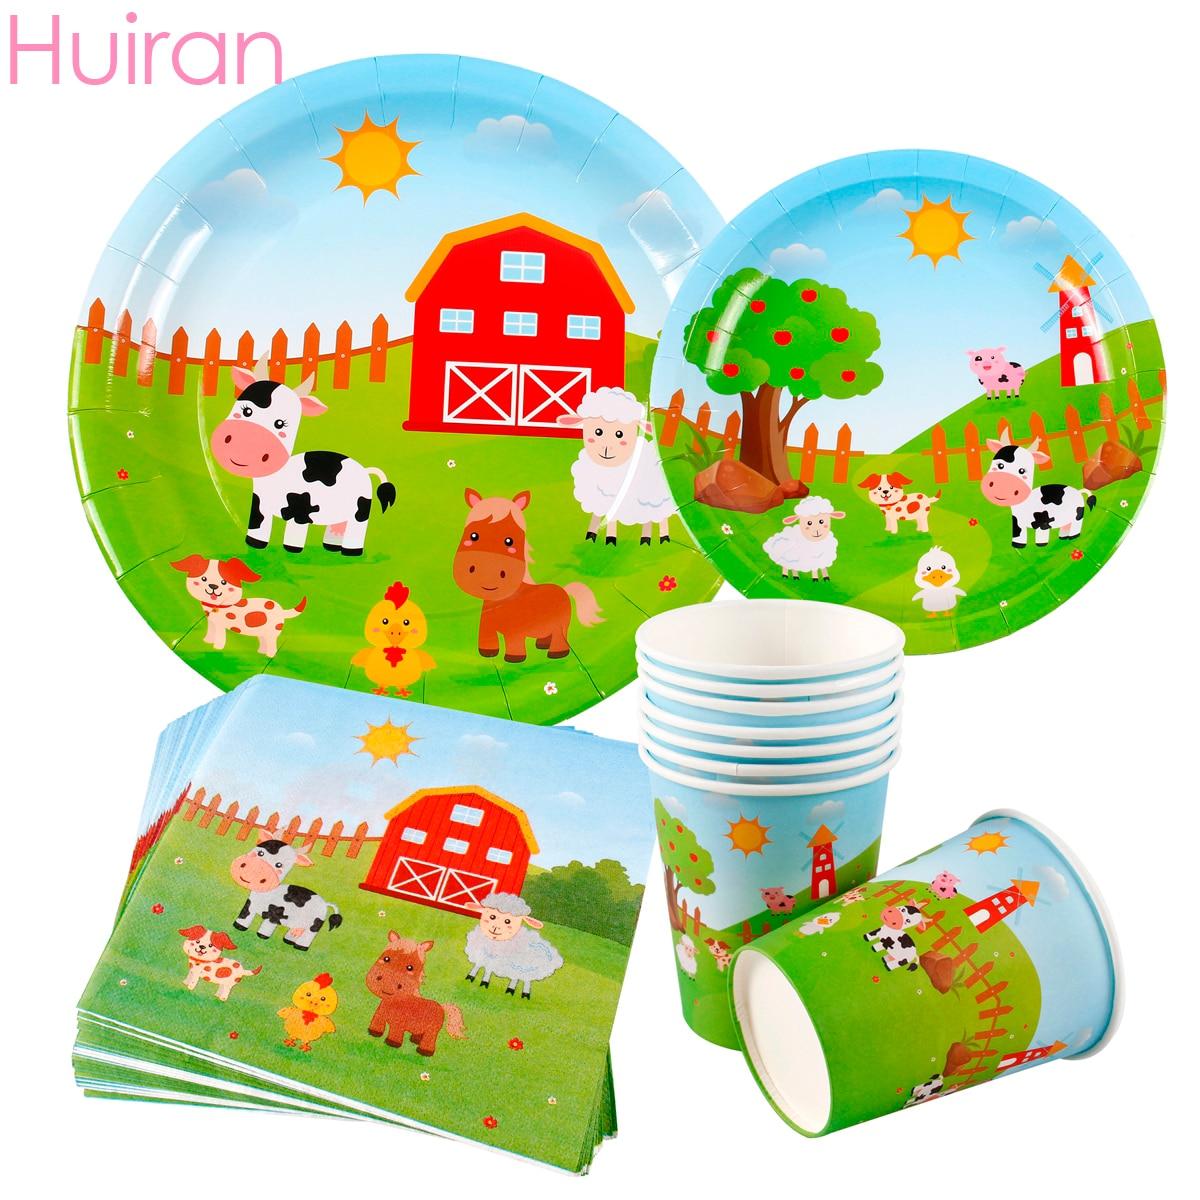 Huiran Farm Animal Party Supplies Happy Birthday Decoration Kids Disposable Tableware Decorative Paper Plates